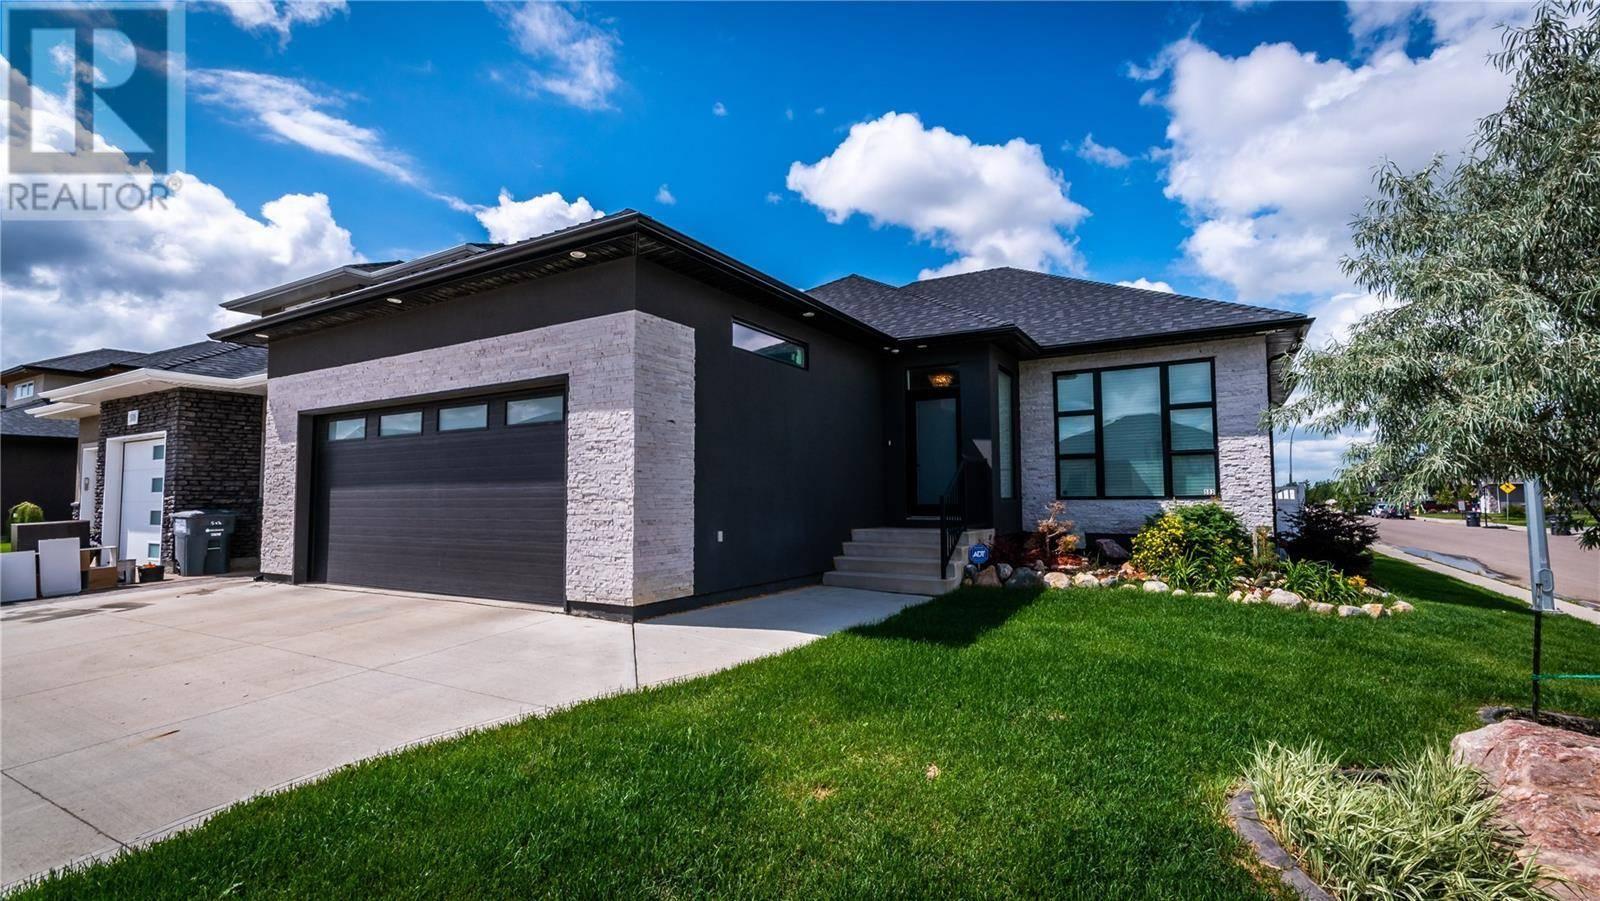 House for sale at 502 Sauer Ter  Saskatoon Saskatchewan - MLS: SK778840